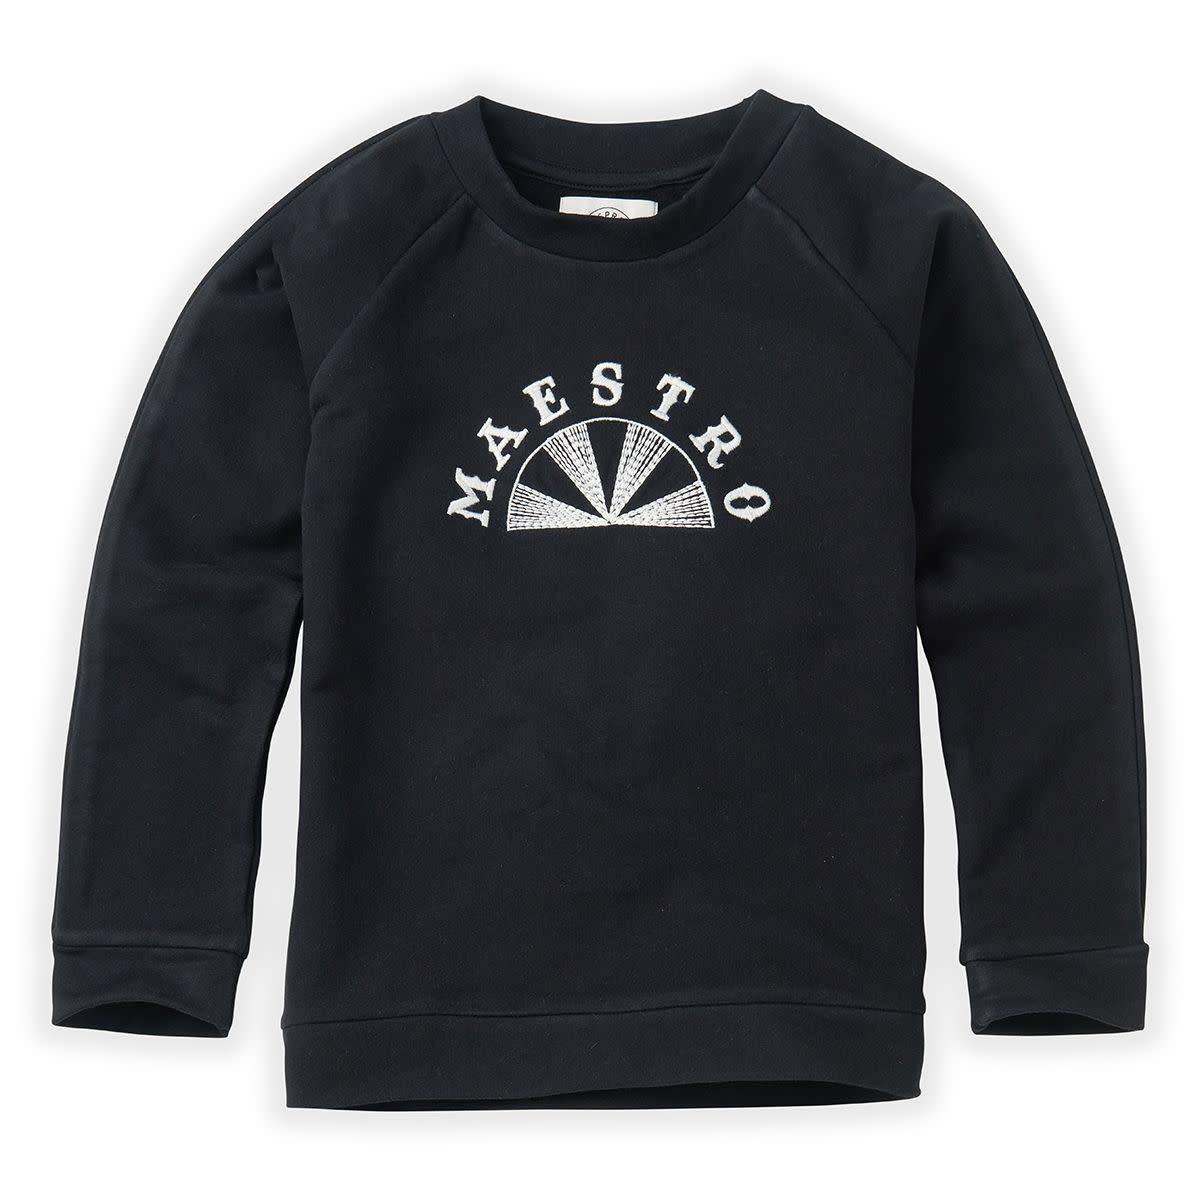 Sproet & Sprout Sproet&Sprout - Sweatshirt raglan meastro black